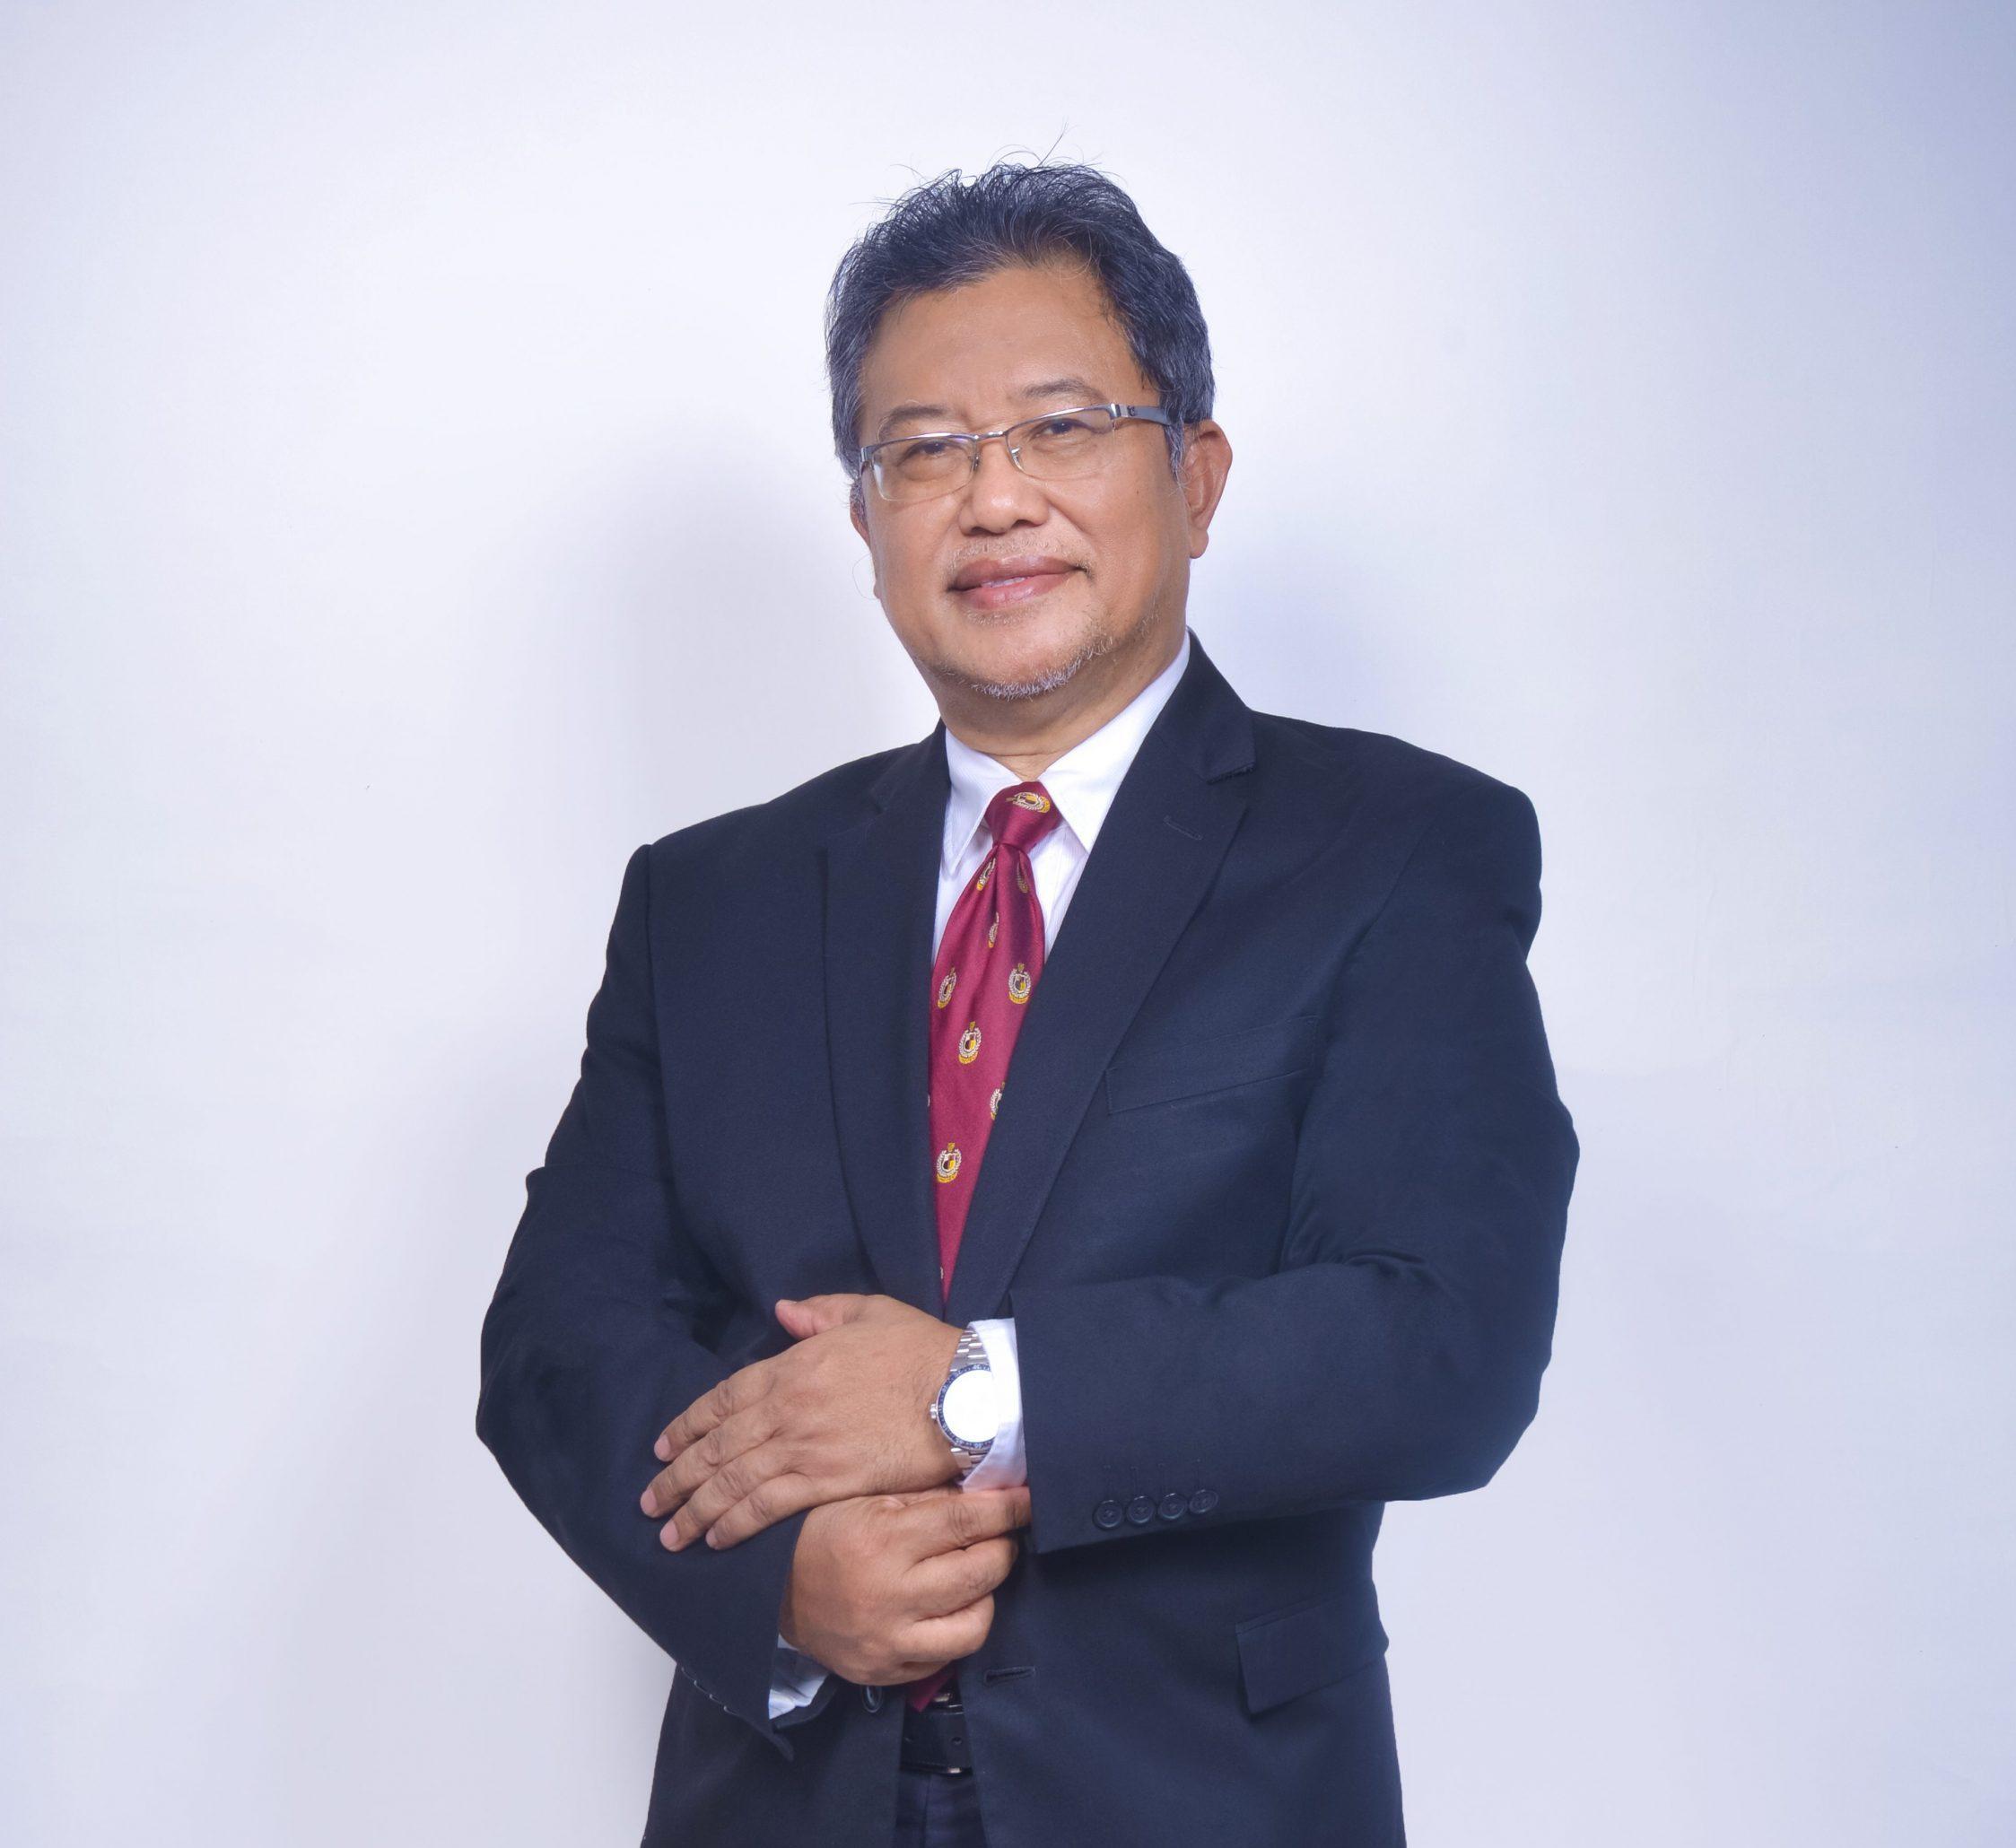 Mohd Zam